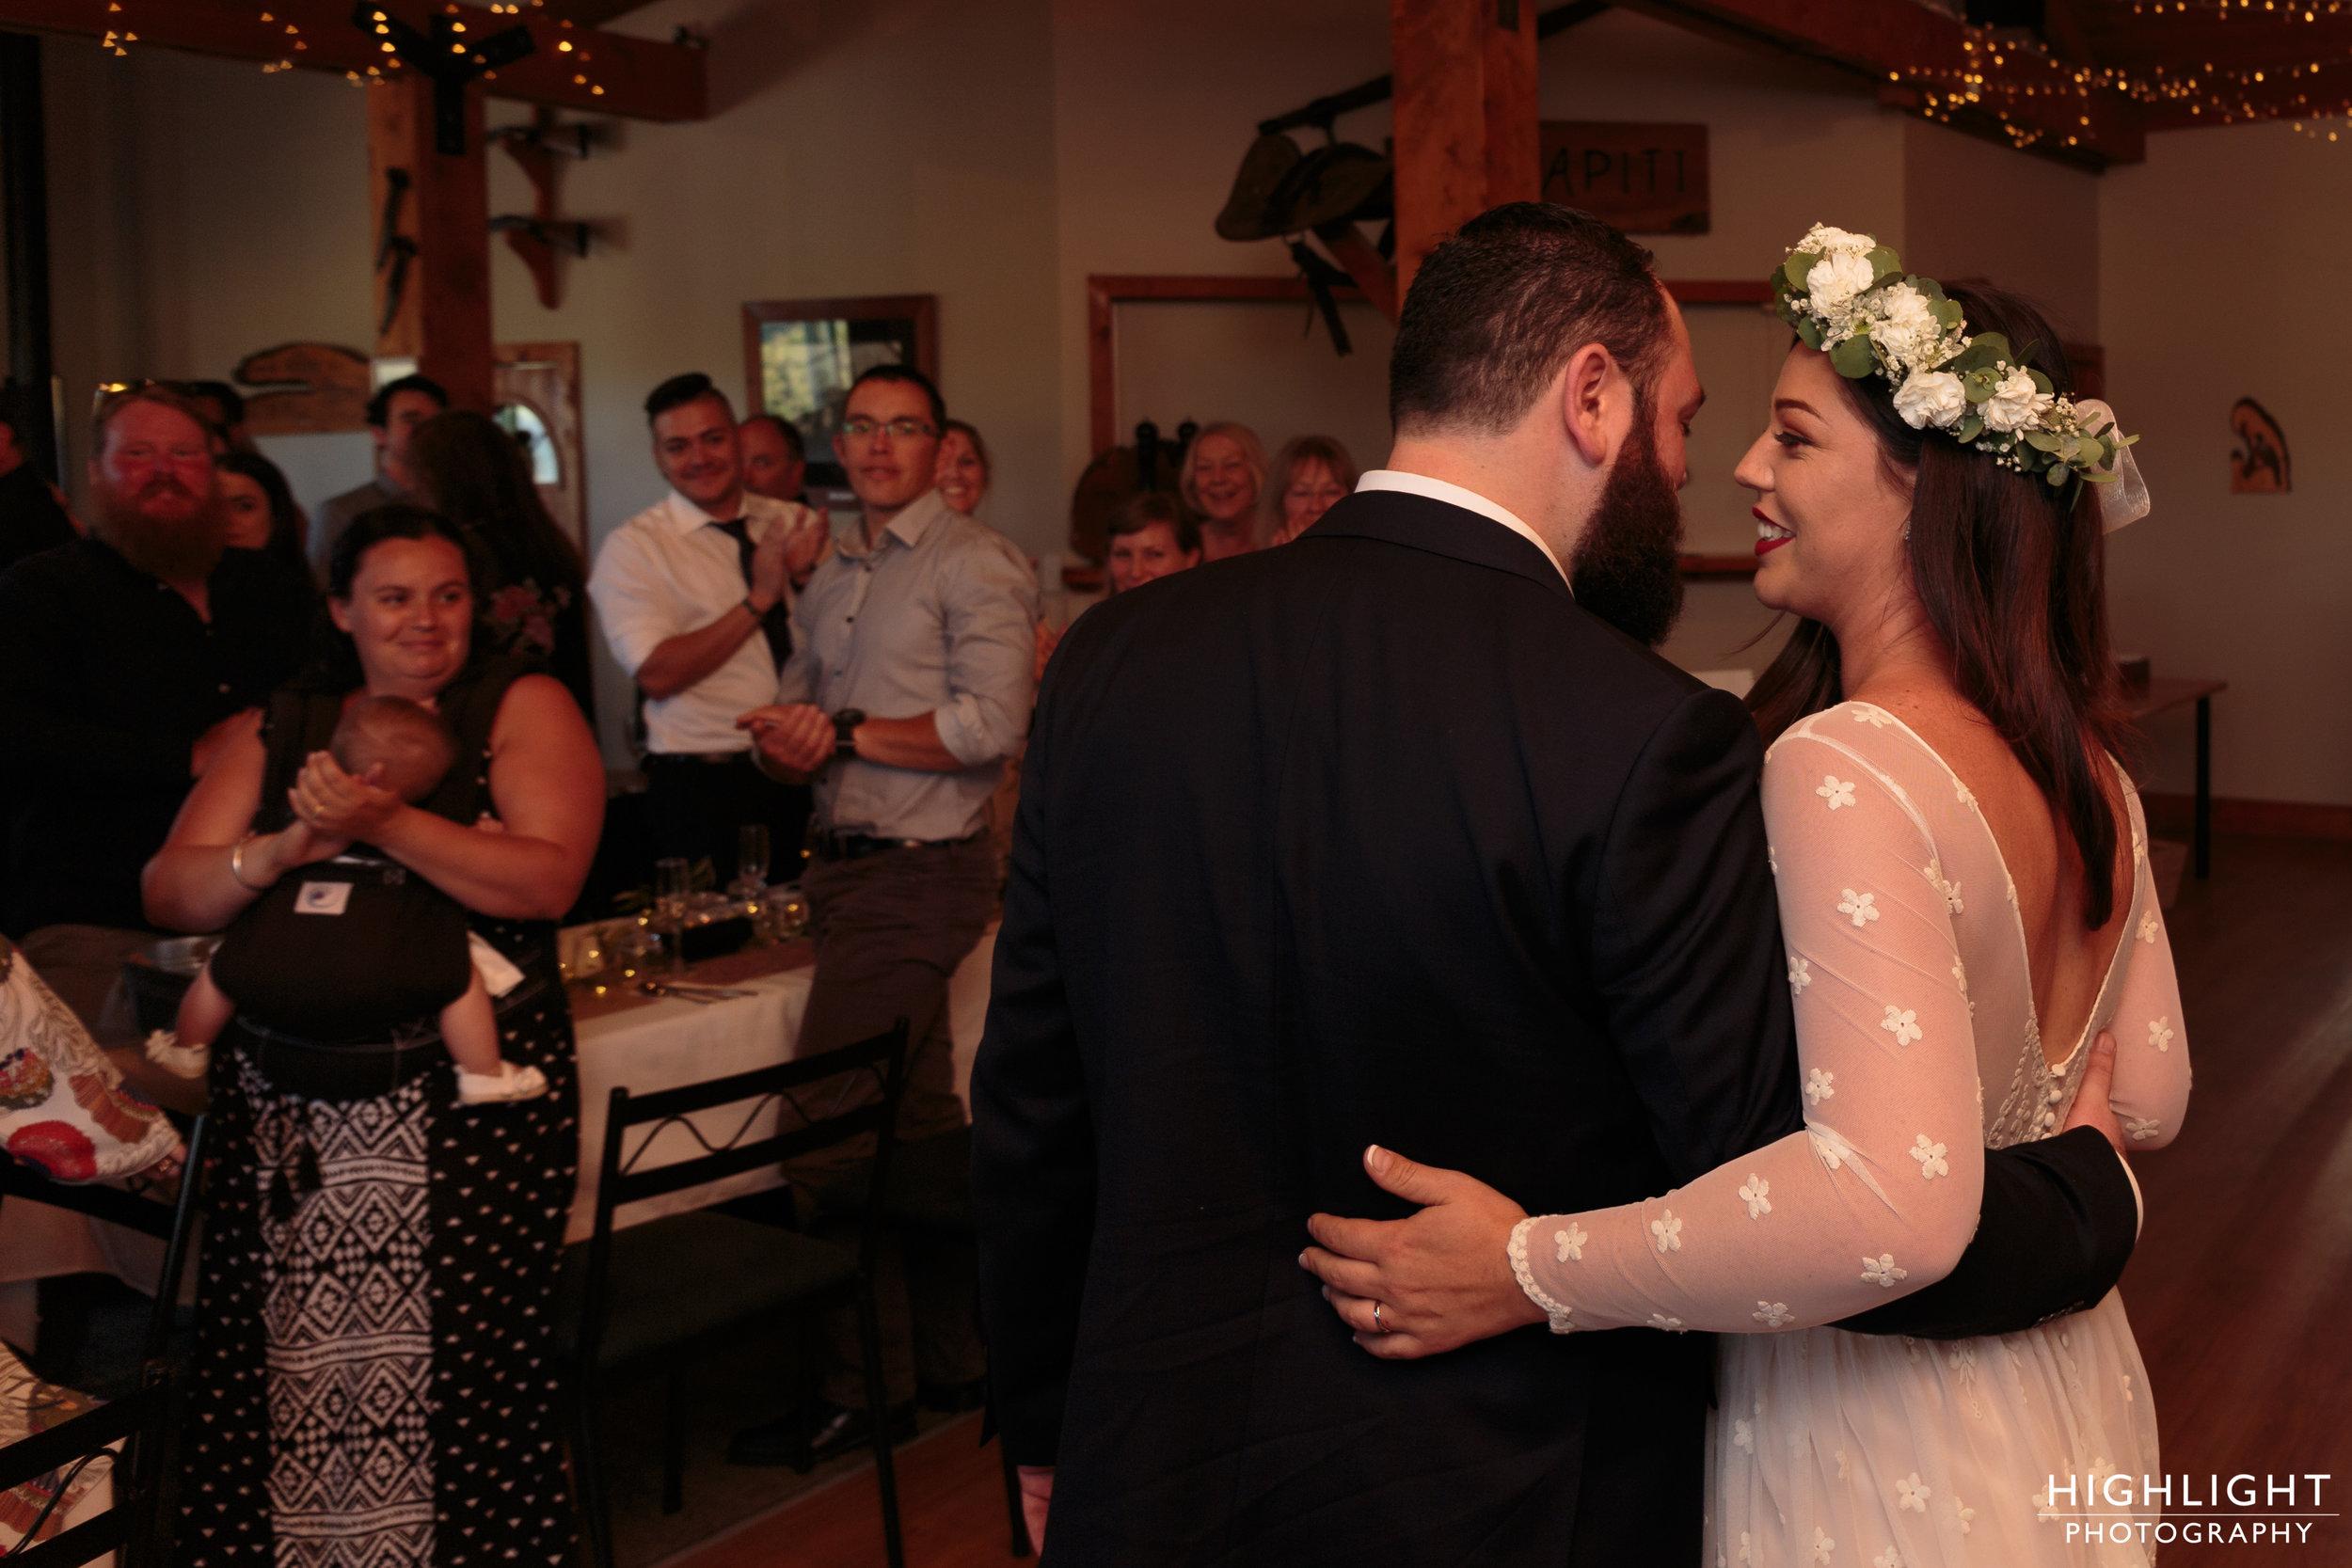 highlight-wedding-photography-new-zealand-makoura-lodge-wedding-151.jpg